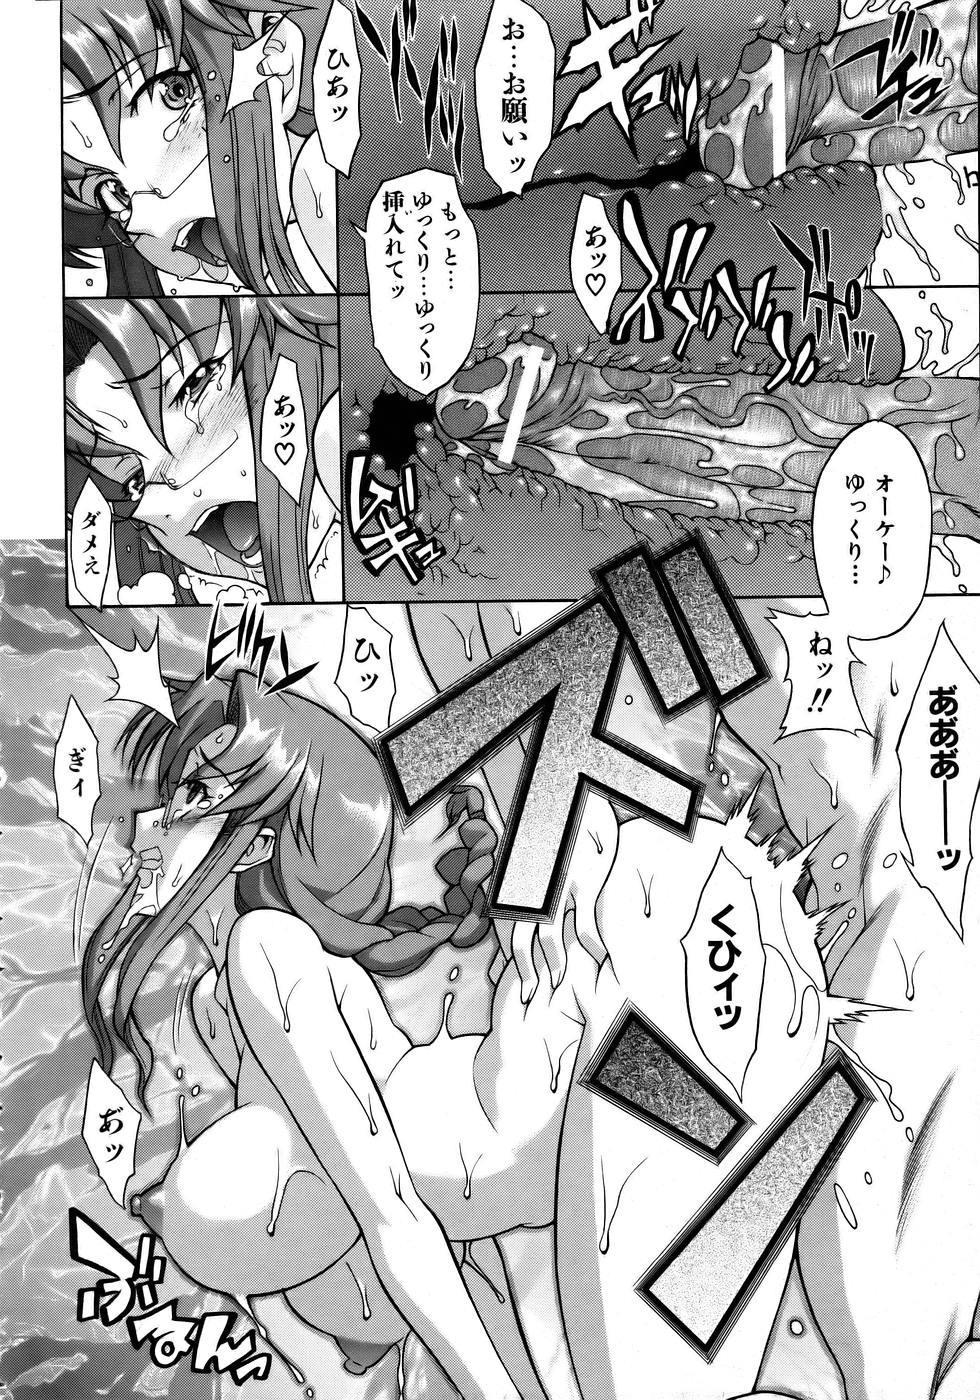 COMIC AUN 2005-12 Vol. 115 99